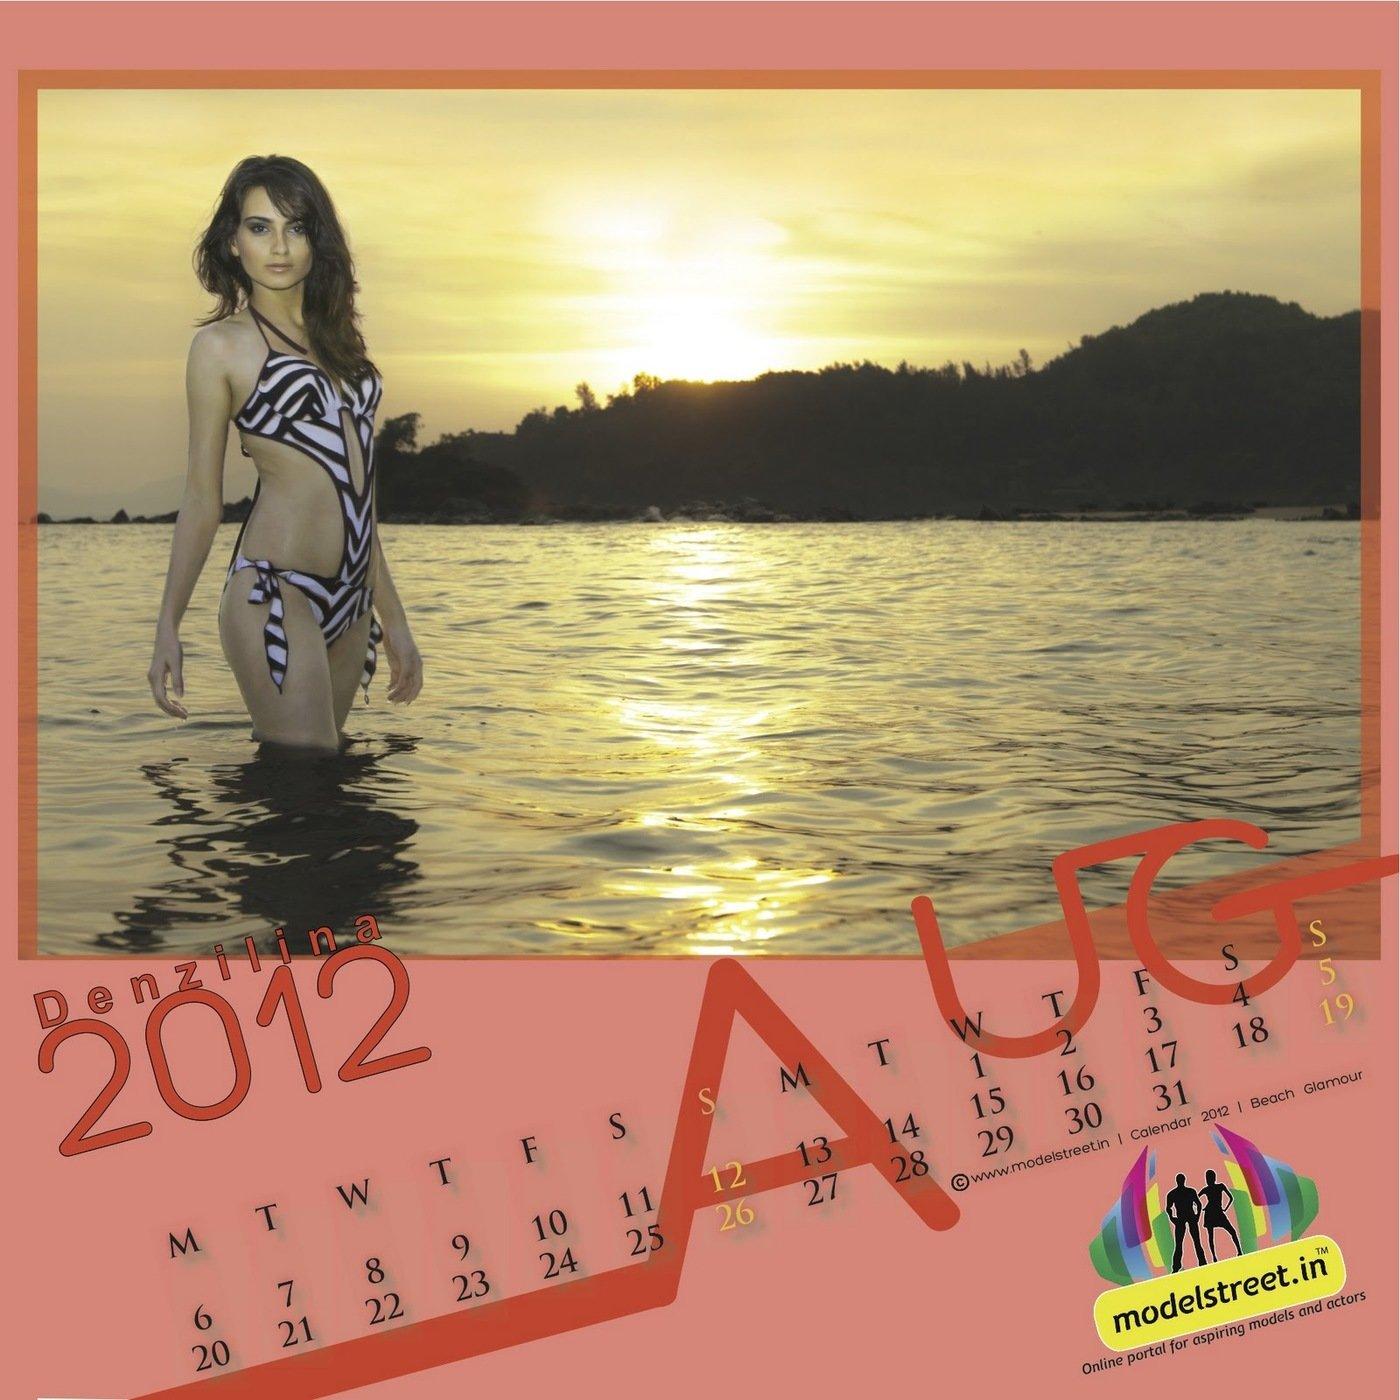 Mtv chanel bikini calendar — img 15